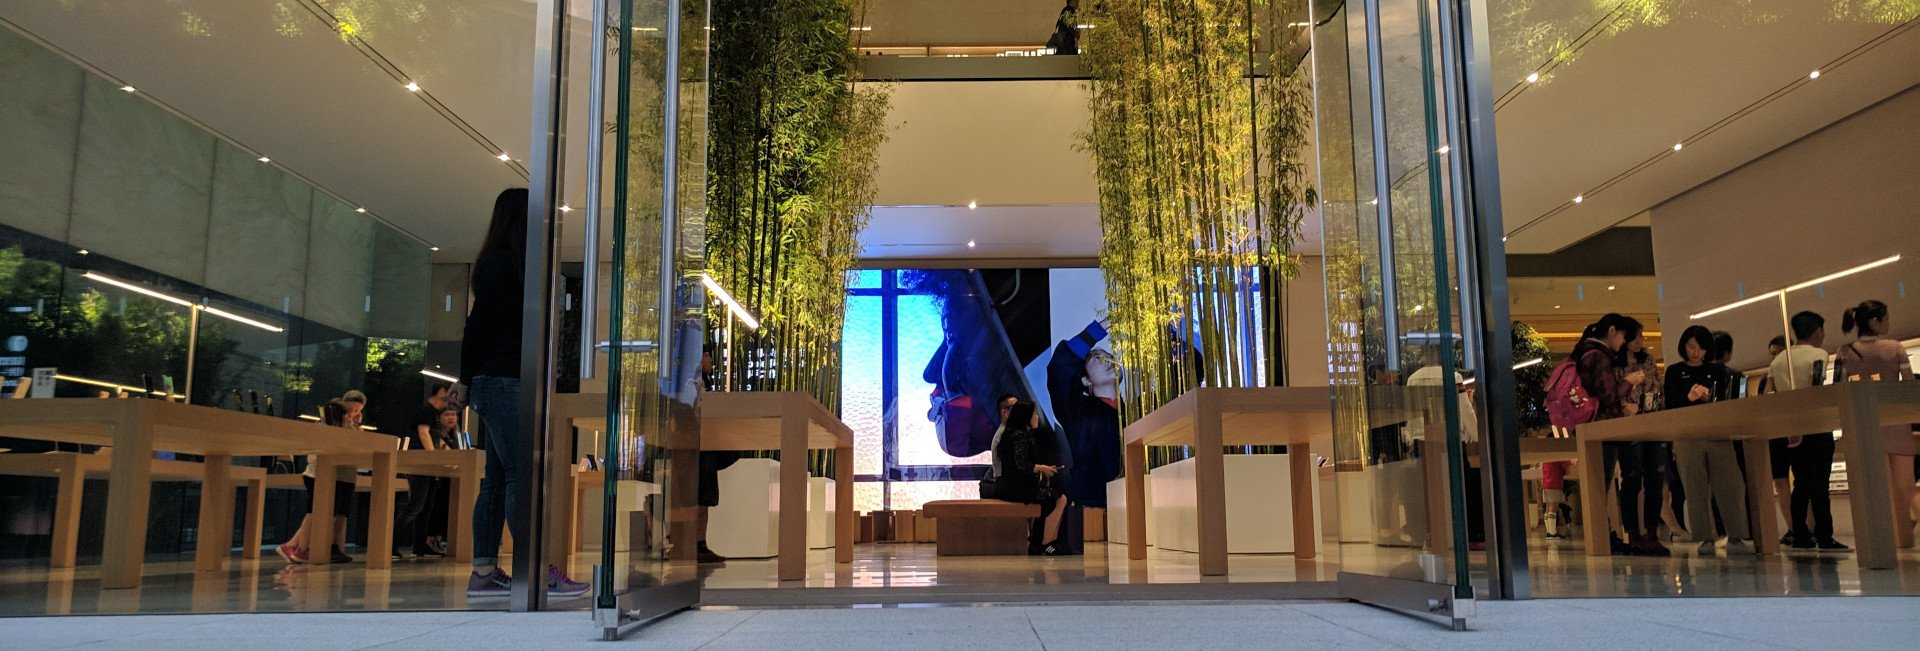 Micro LED Video wall at Apple Macau (Photo: invidis)